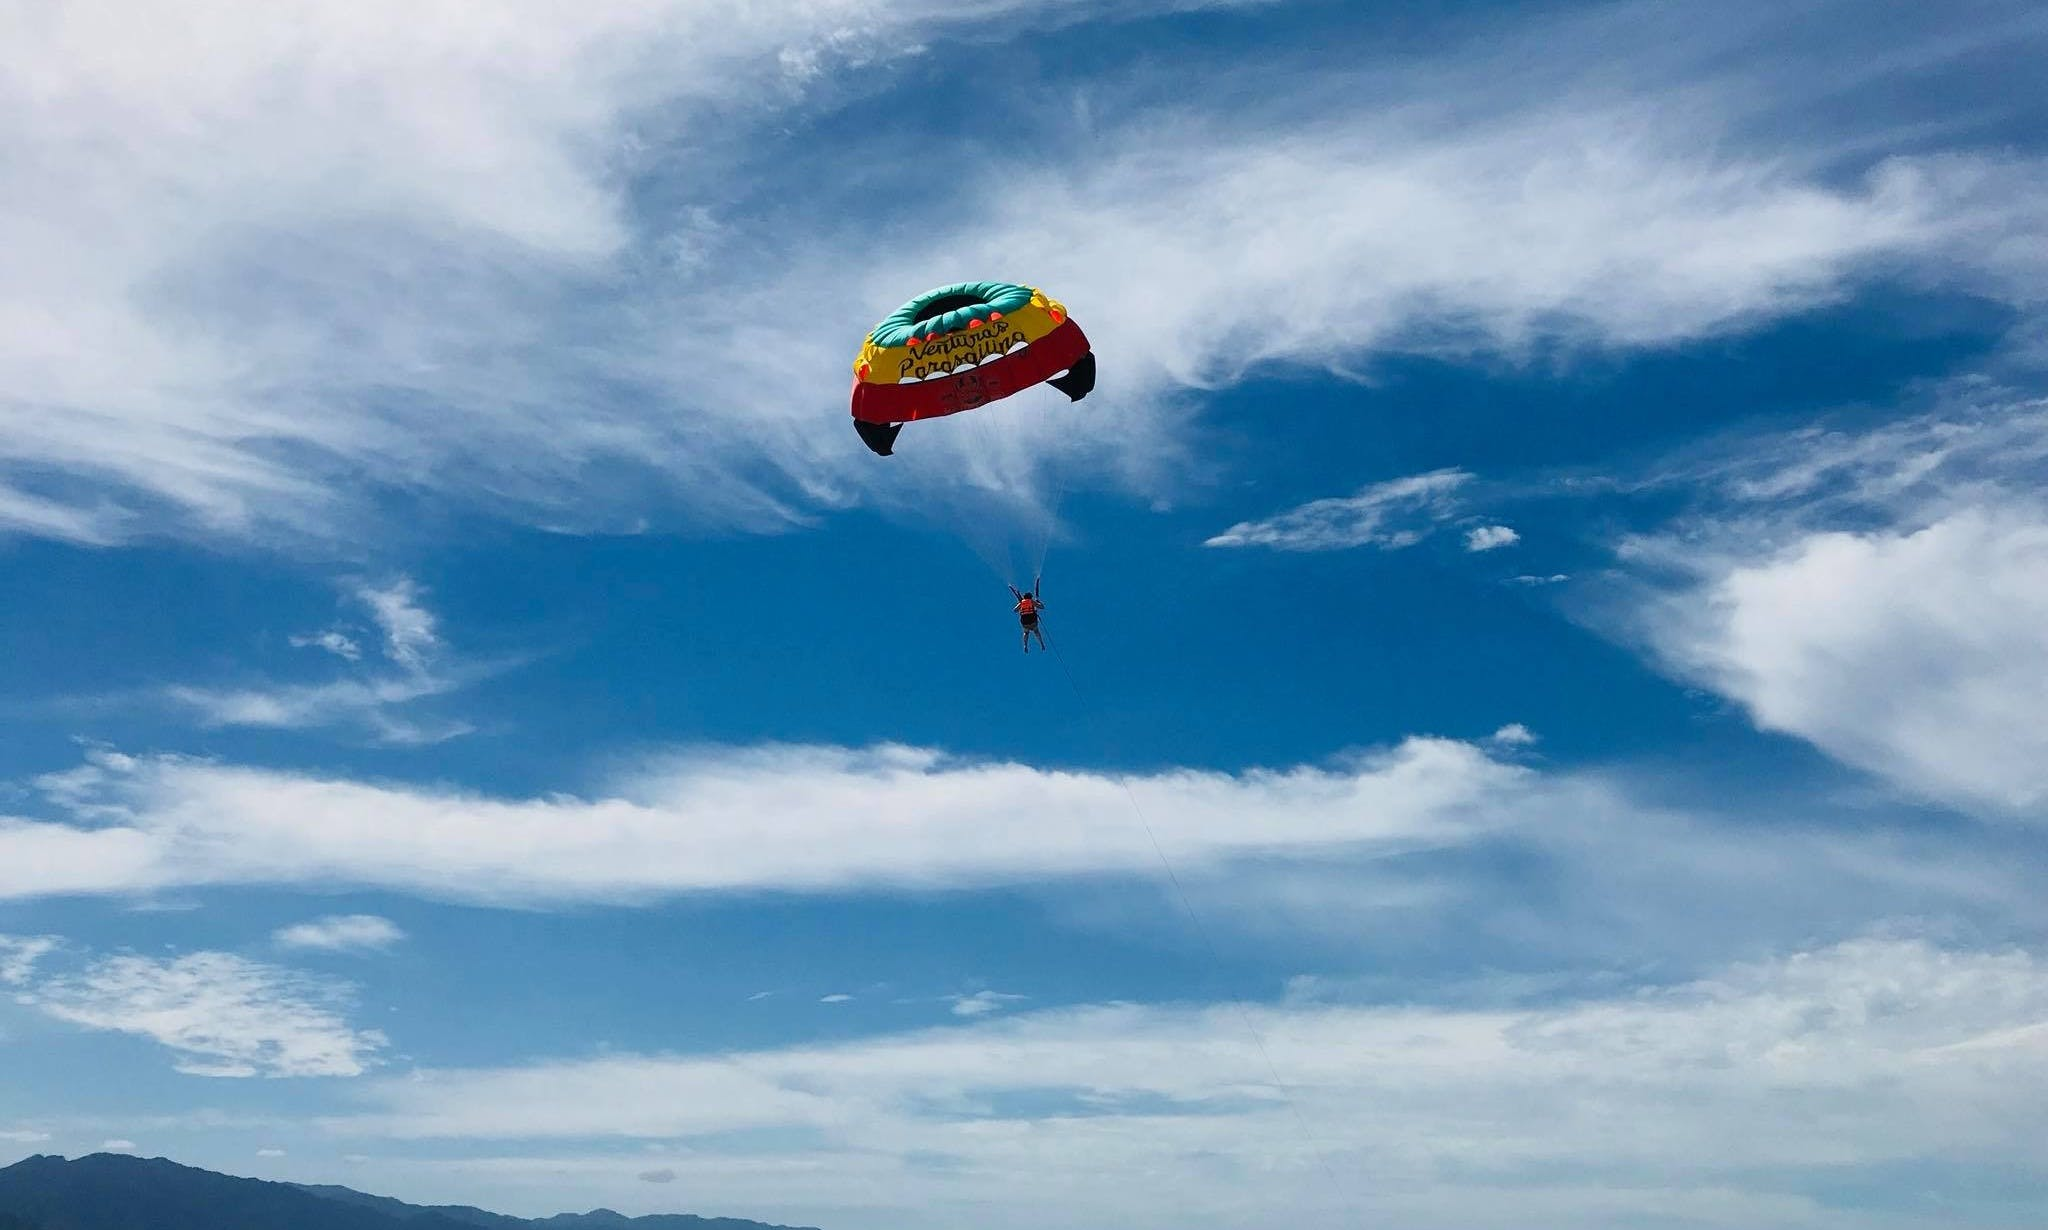 Experience the Puerto Vallarta Parasailing Adventure of a Lifetime!